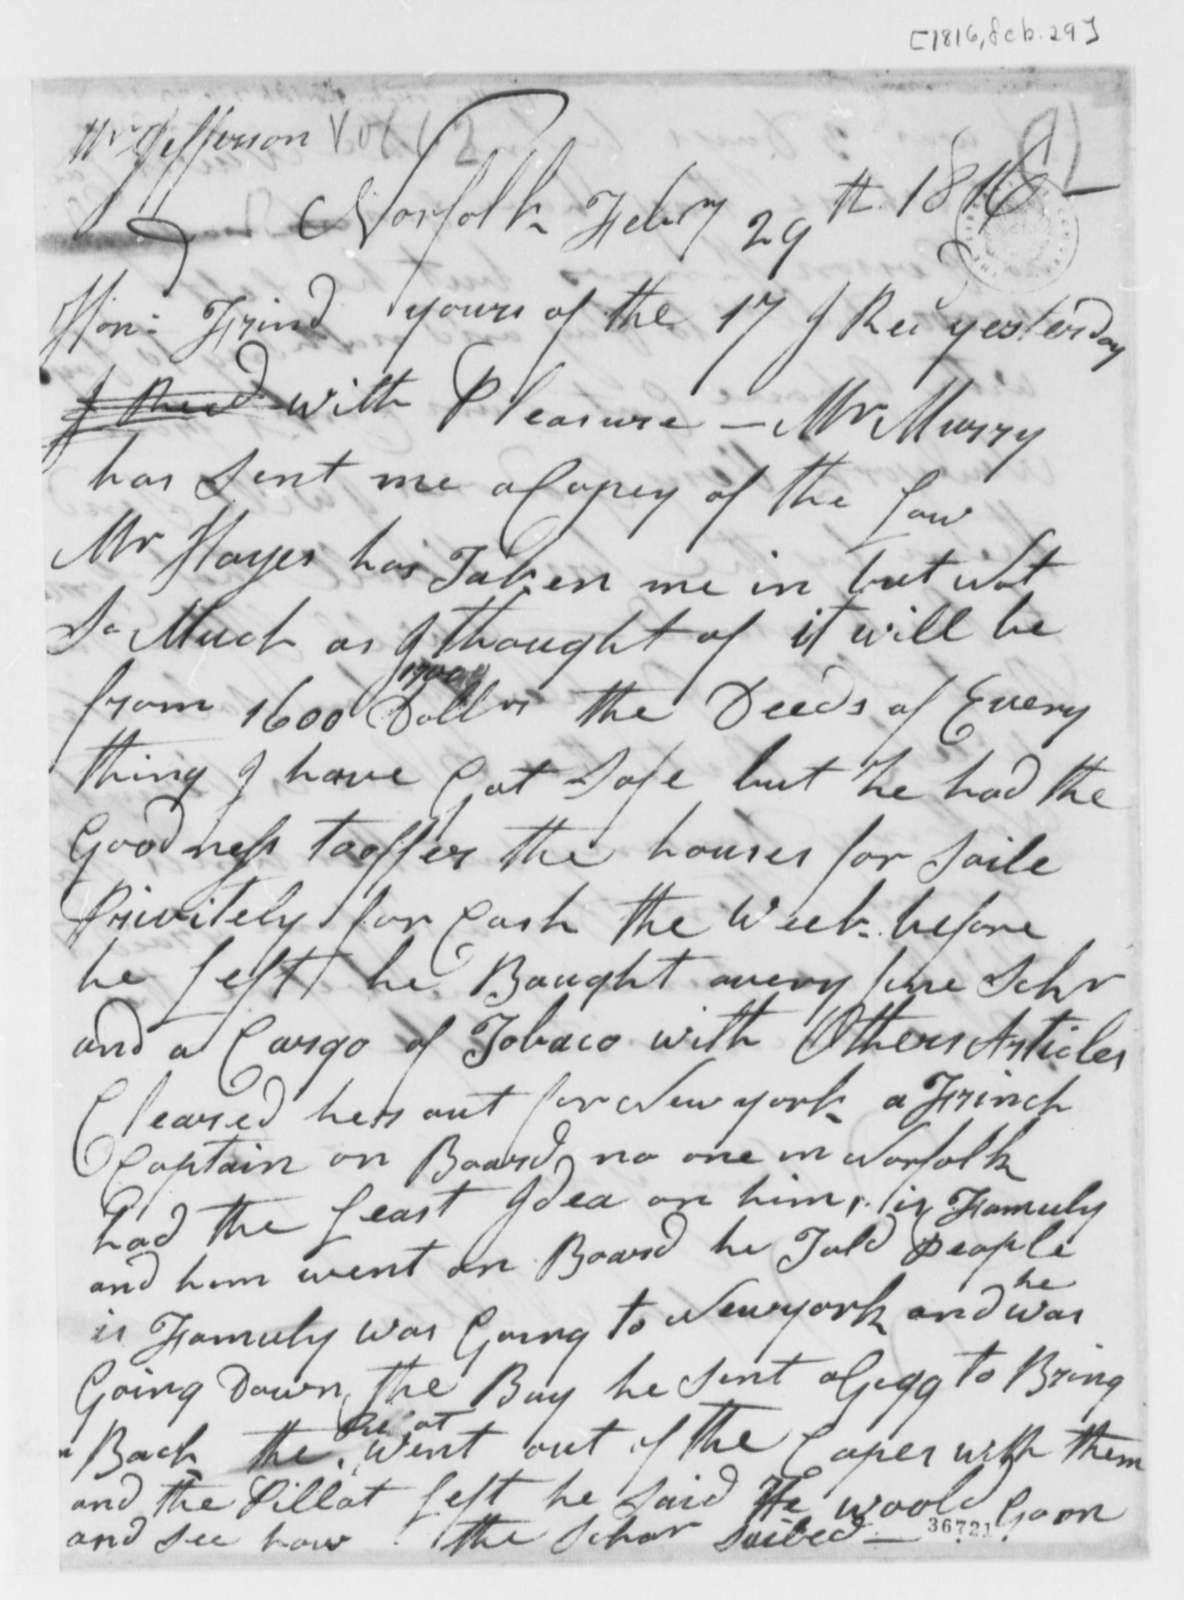 Joseph Miller to Thomas Jefferson, February 29, 1816